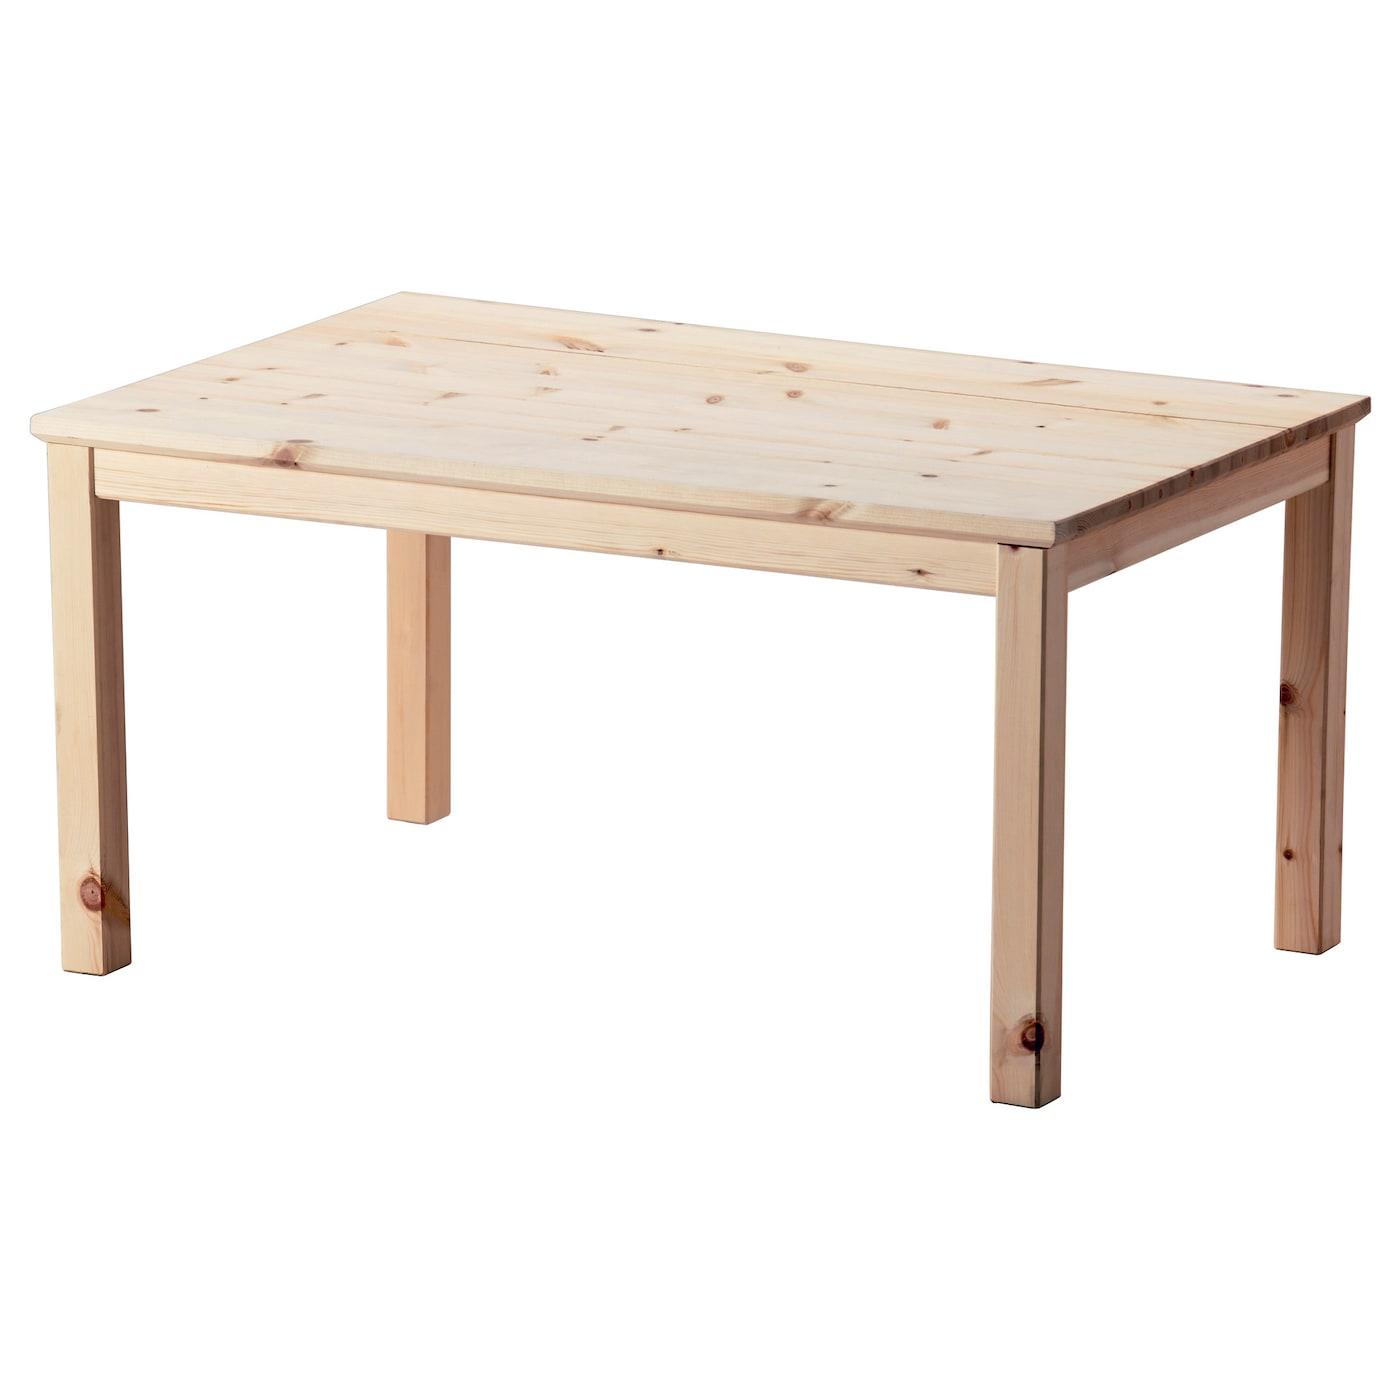 NORNS Coffee table Pine 89x59 cm IKEA